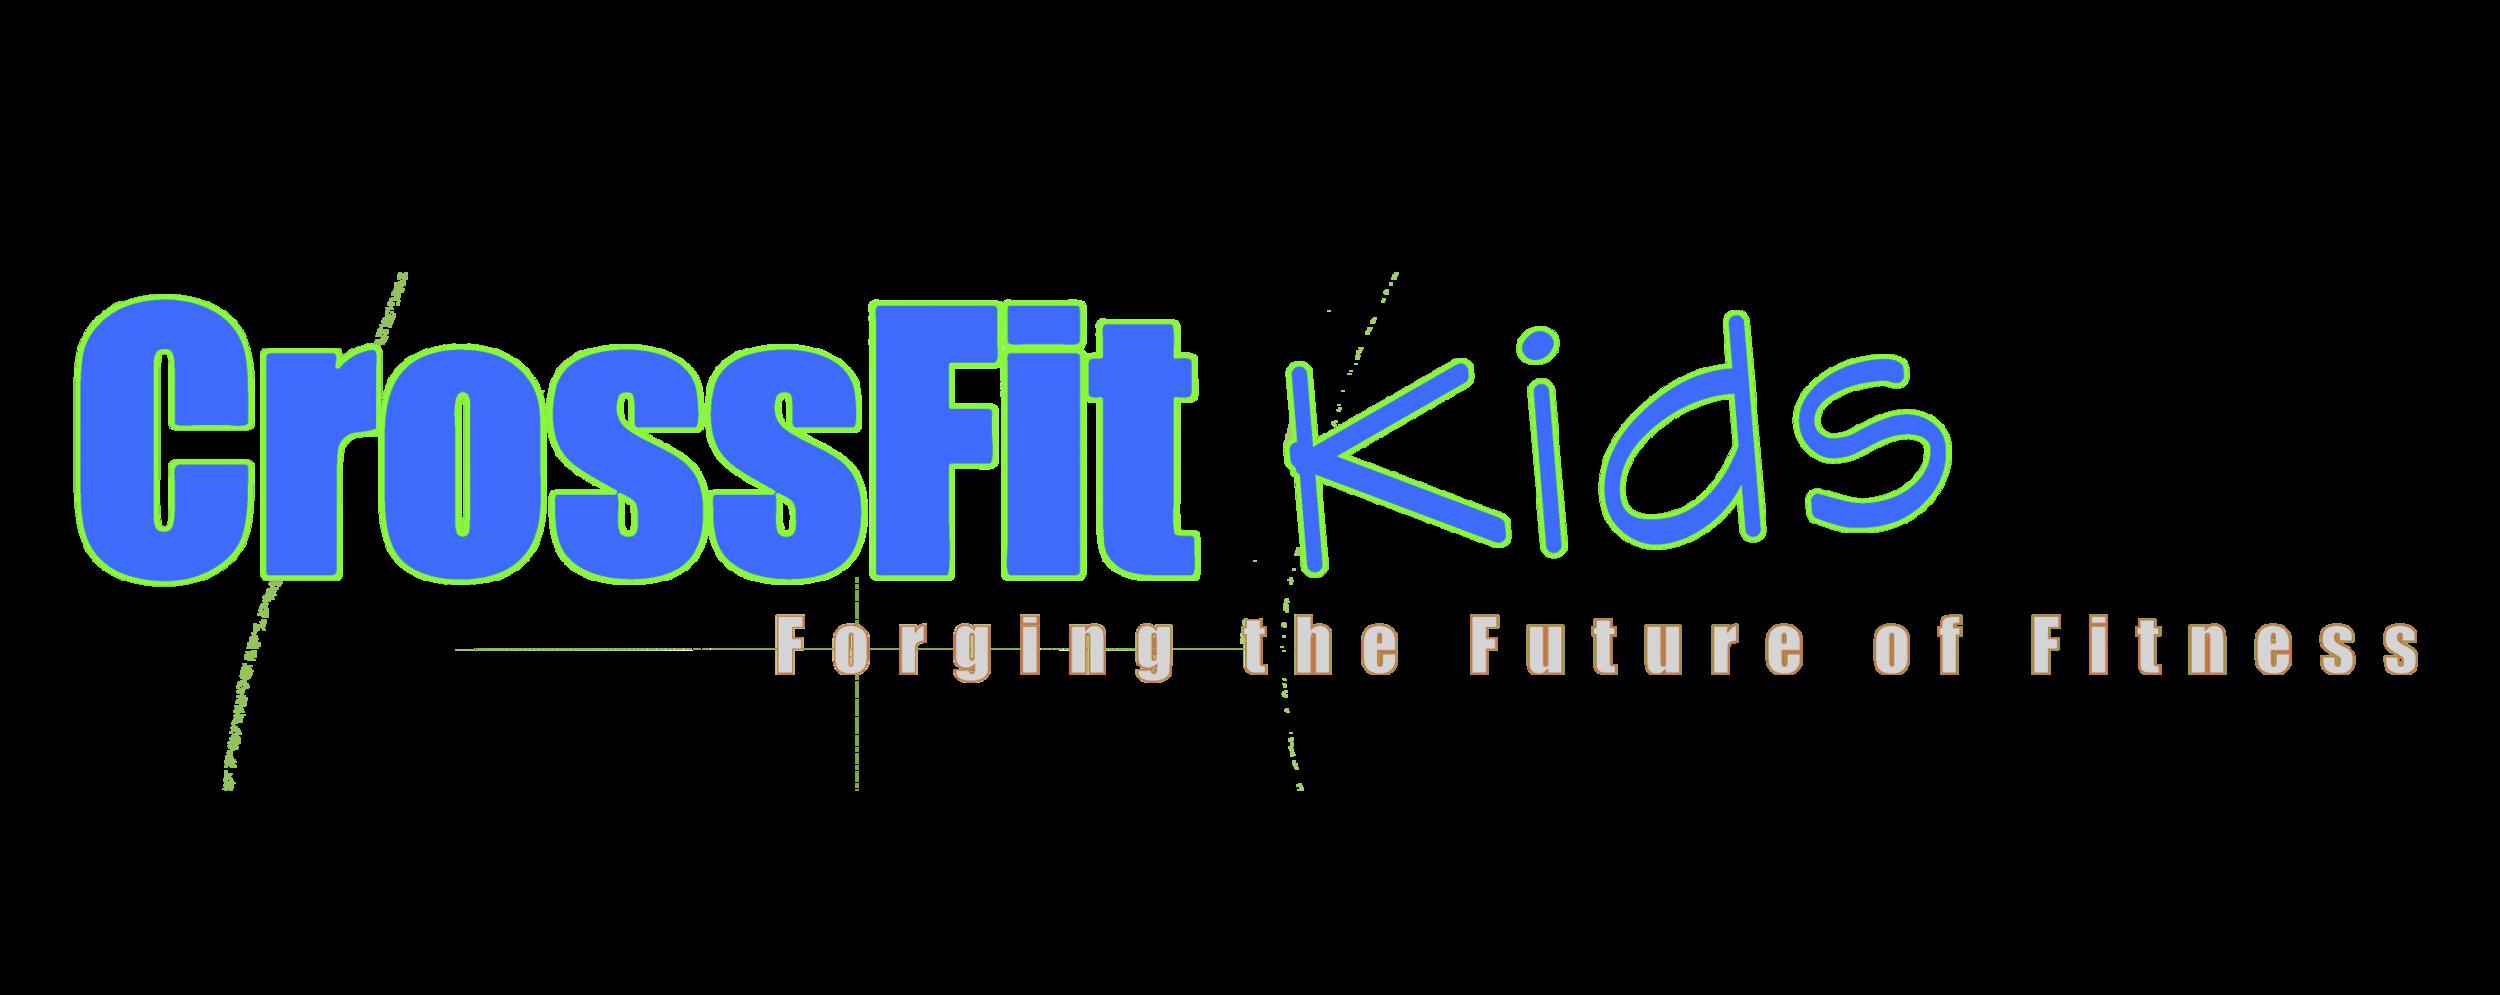 crossfit-kids-logo-scroll.png